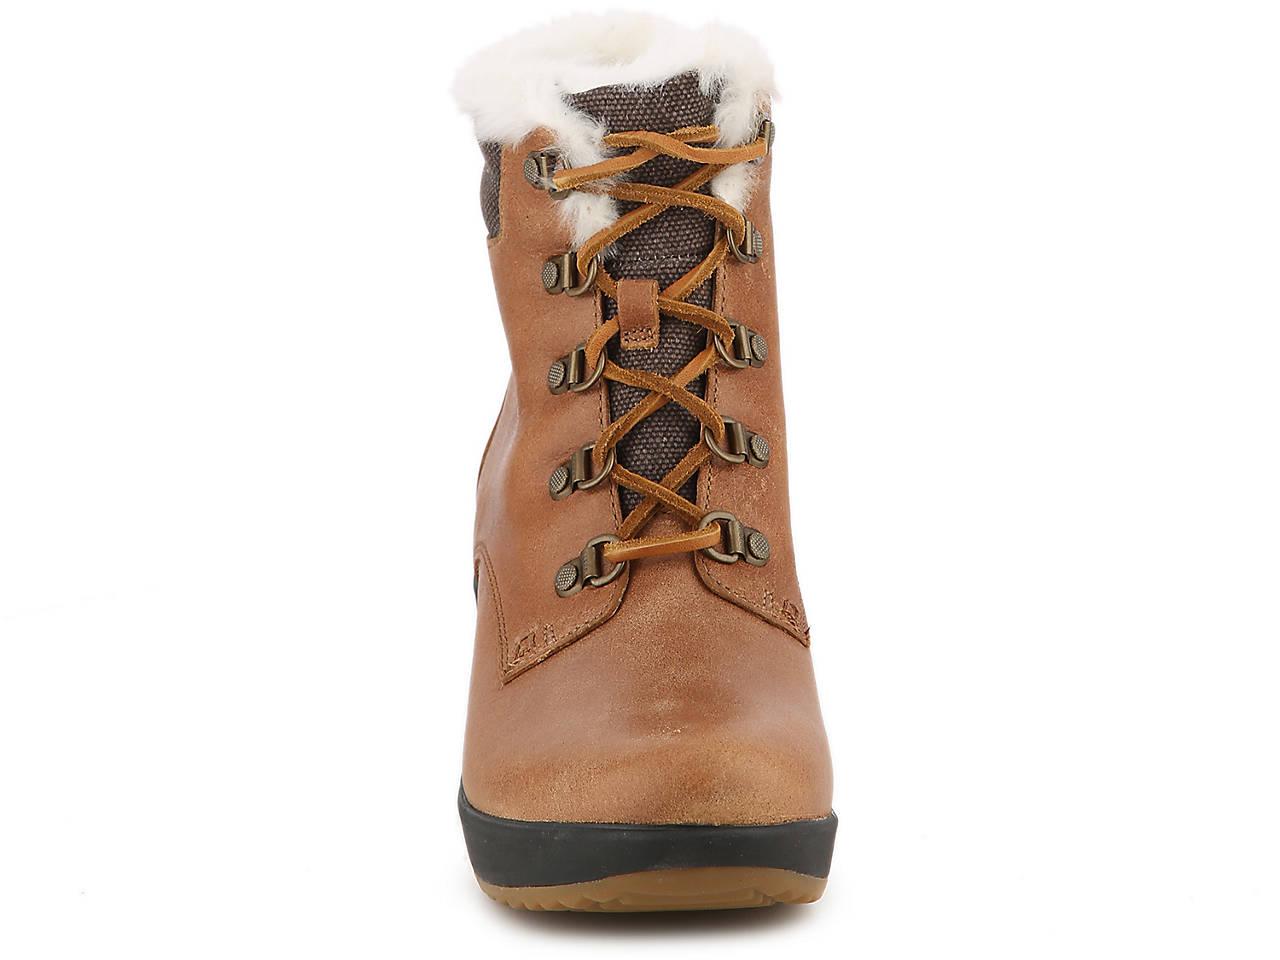 cb87297def76 Sperry Top-Sider Luca Peak Wedge Bootie Women s Shoes